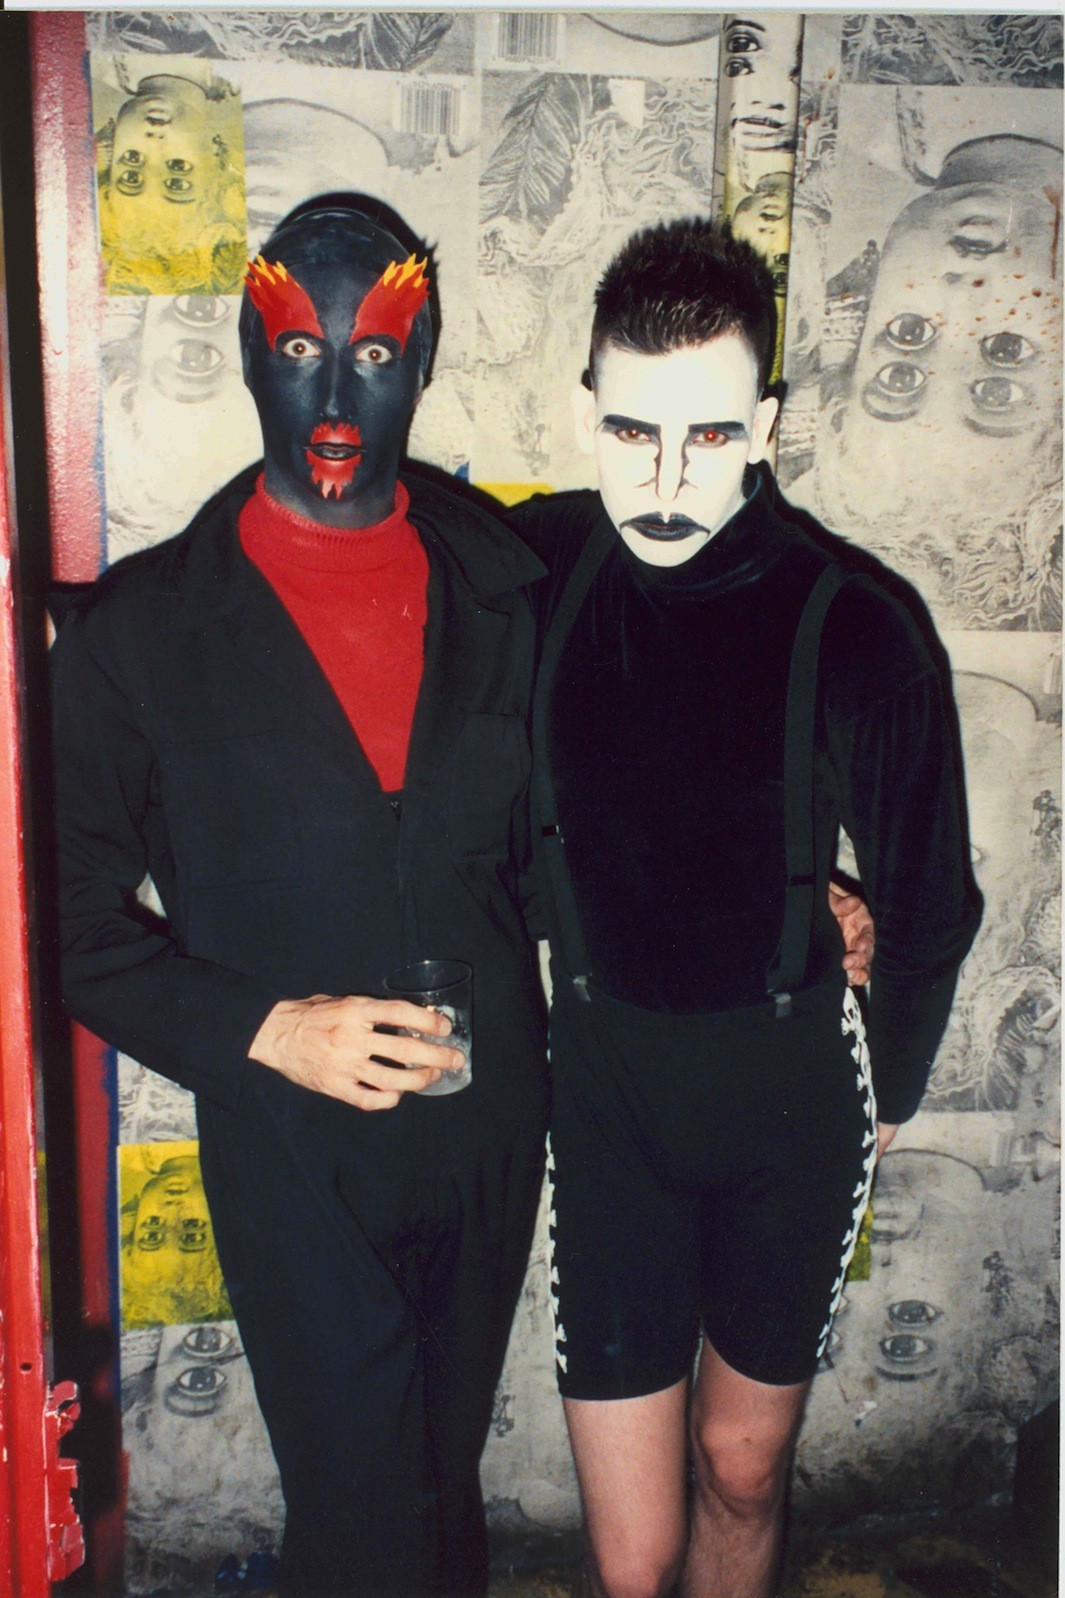 Club kids Keda, left, and Sacred Boy at the Limelight nightclub, 1992.